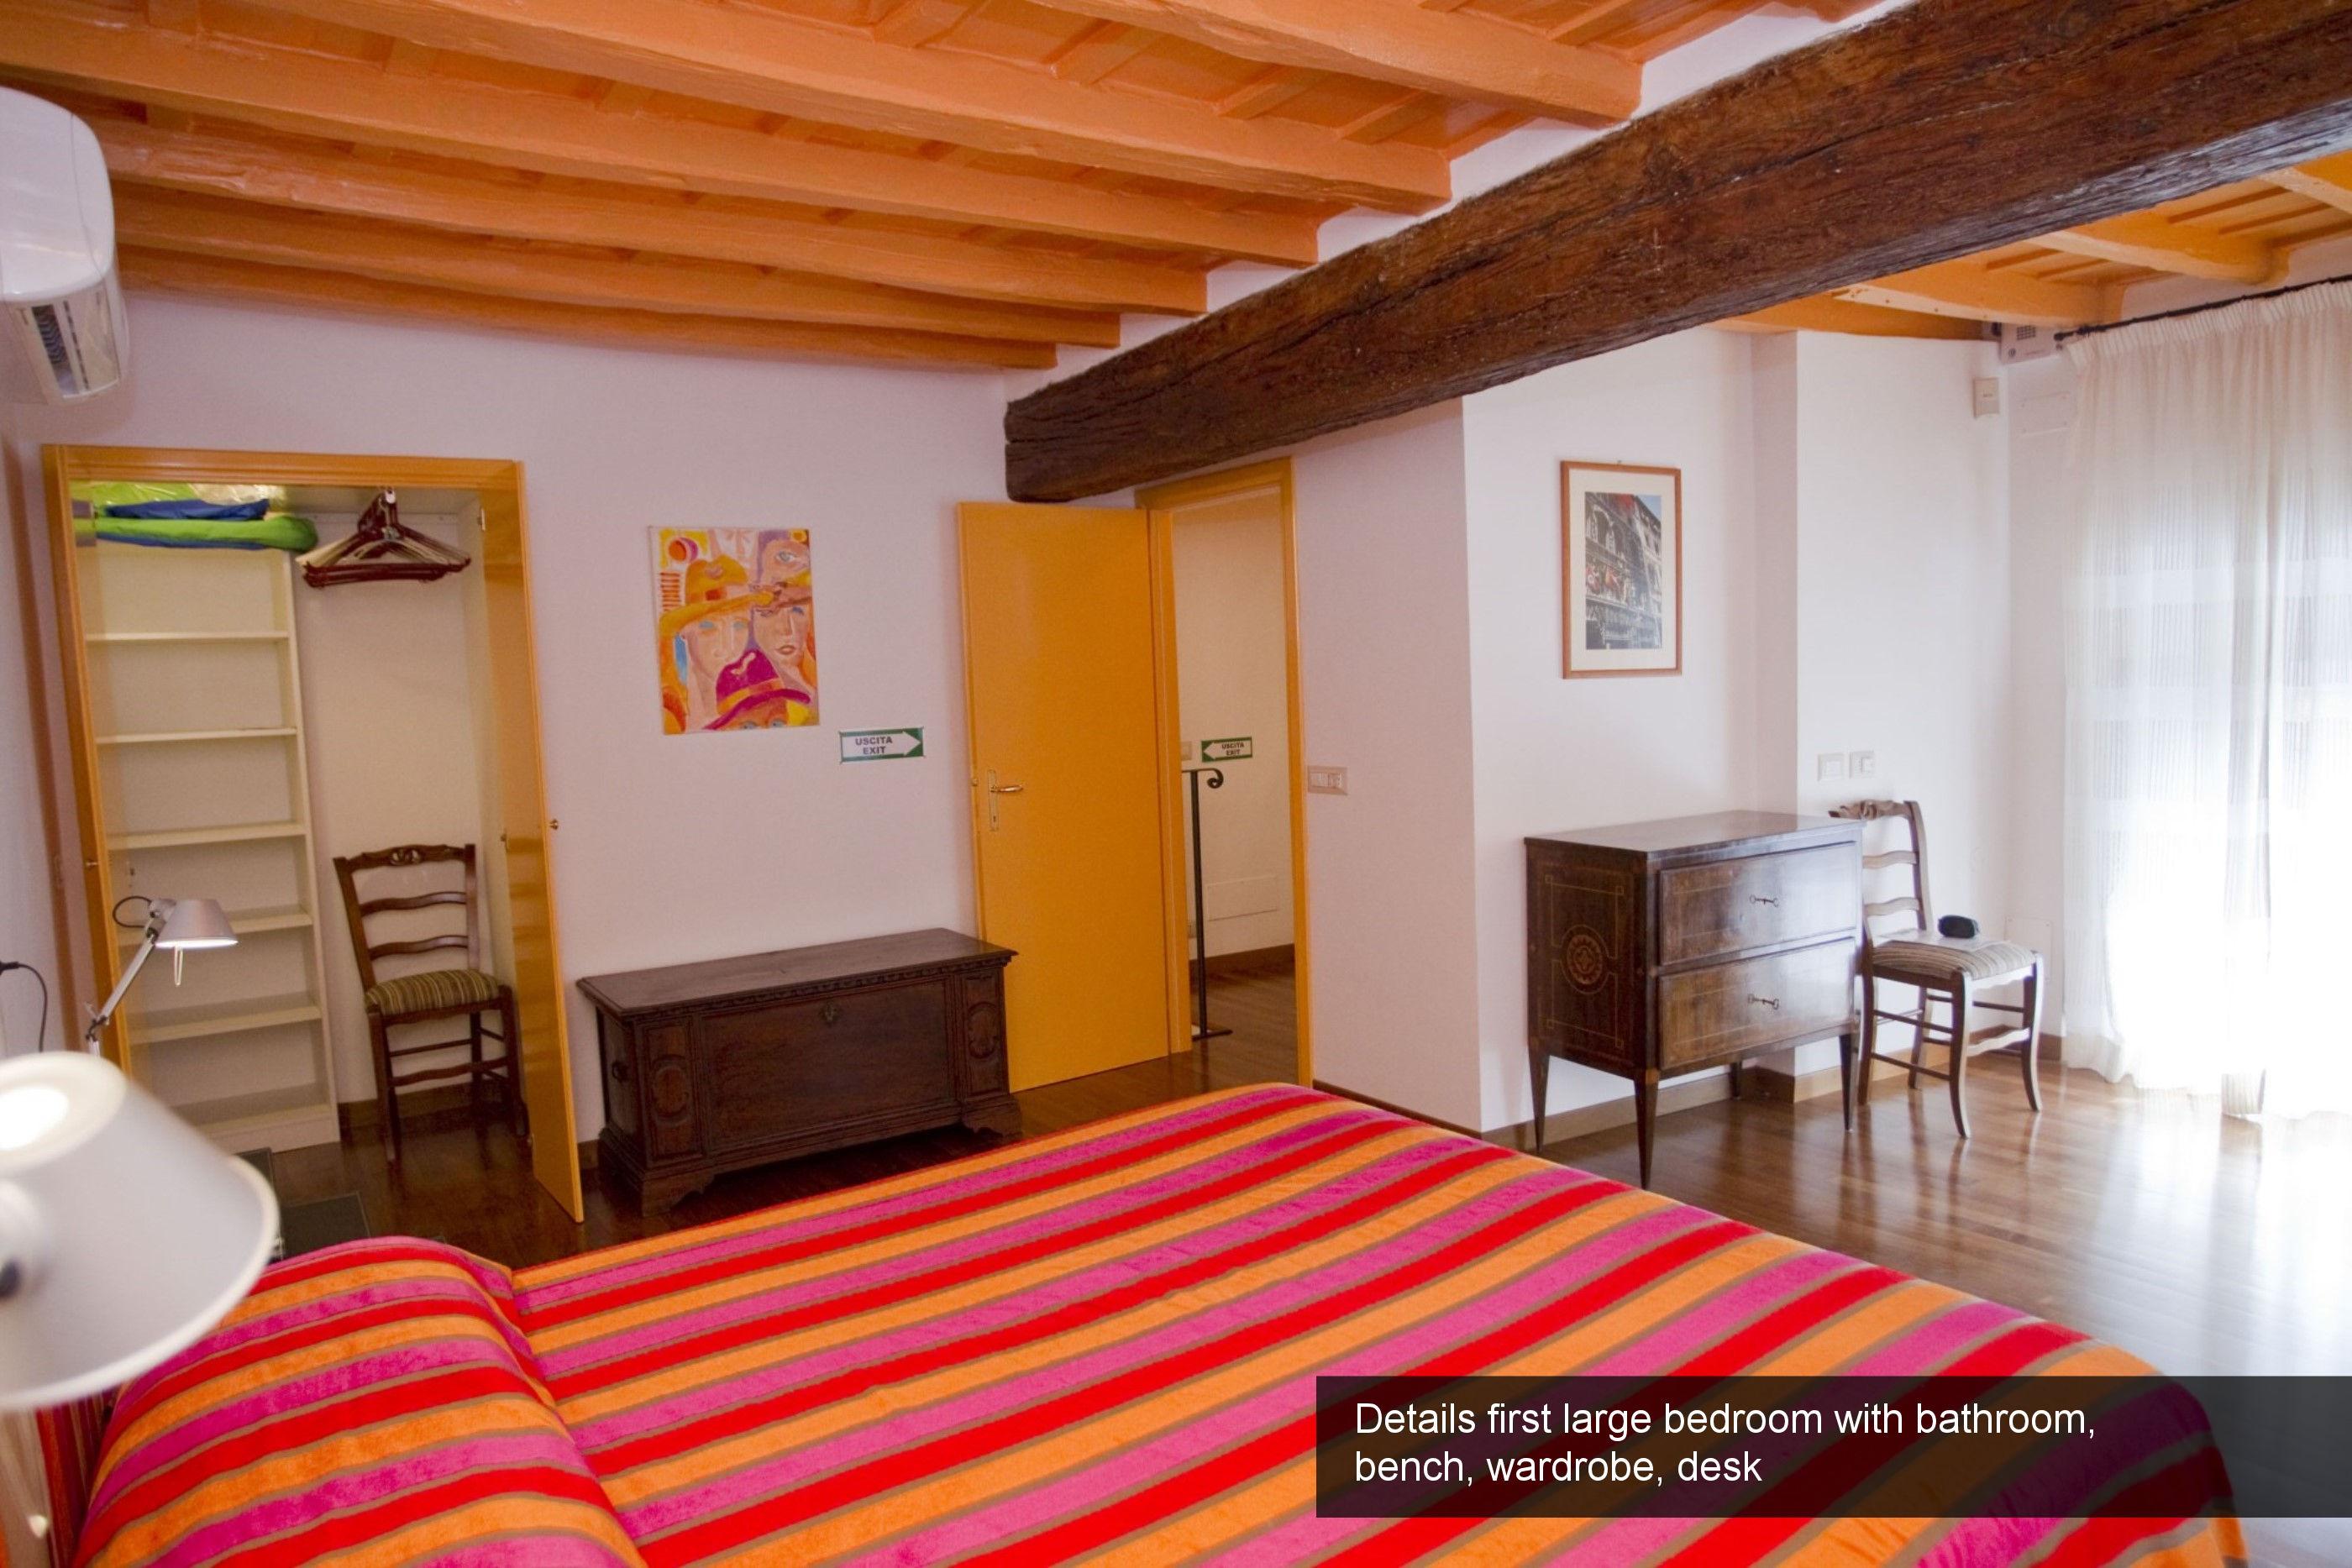 8) Details first large bedroom with bathroom_ bench, wardrobe, desk